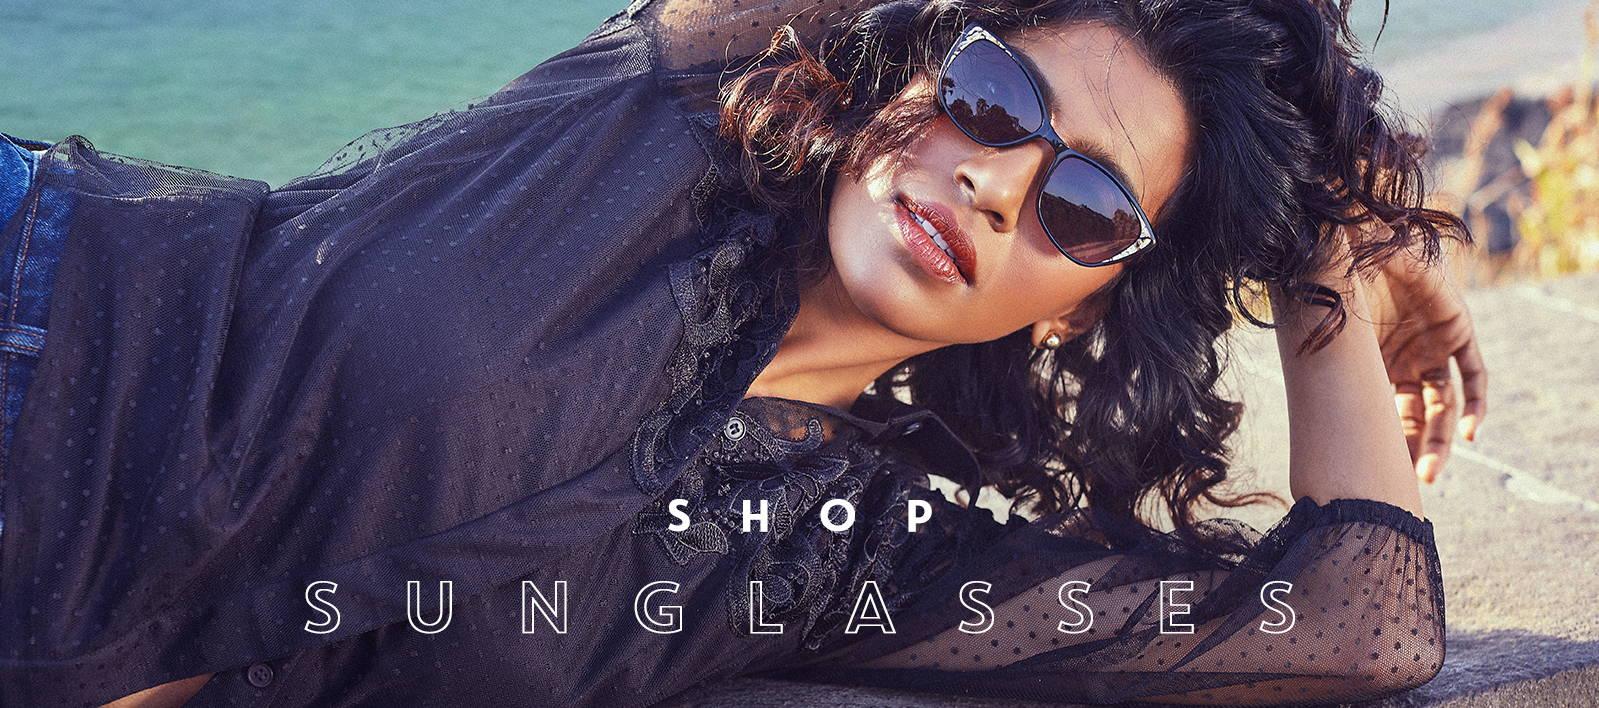 Shop statement sunglasses